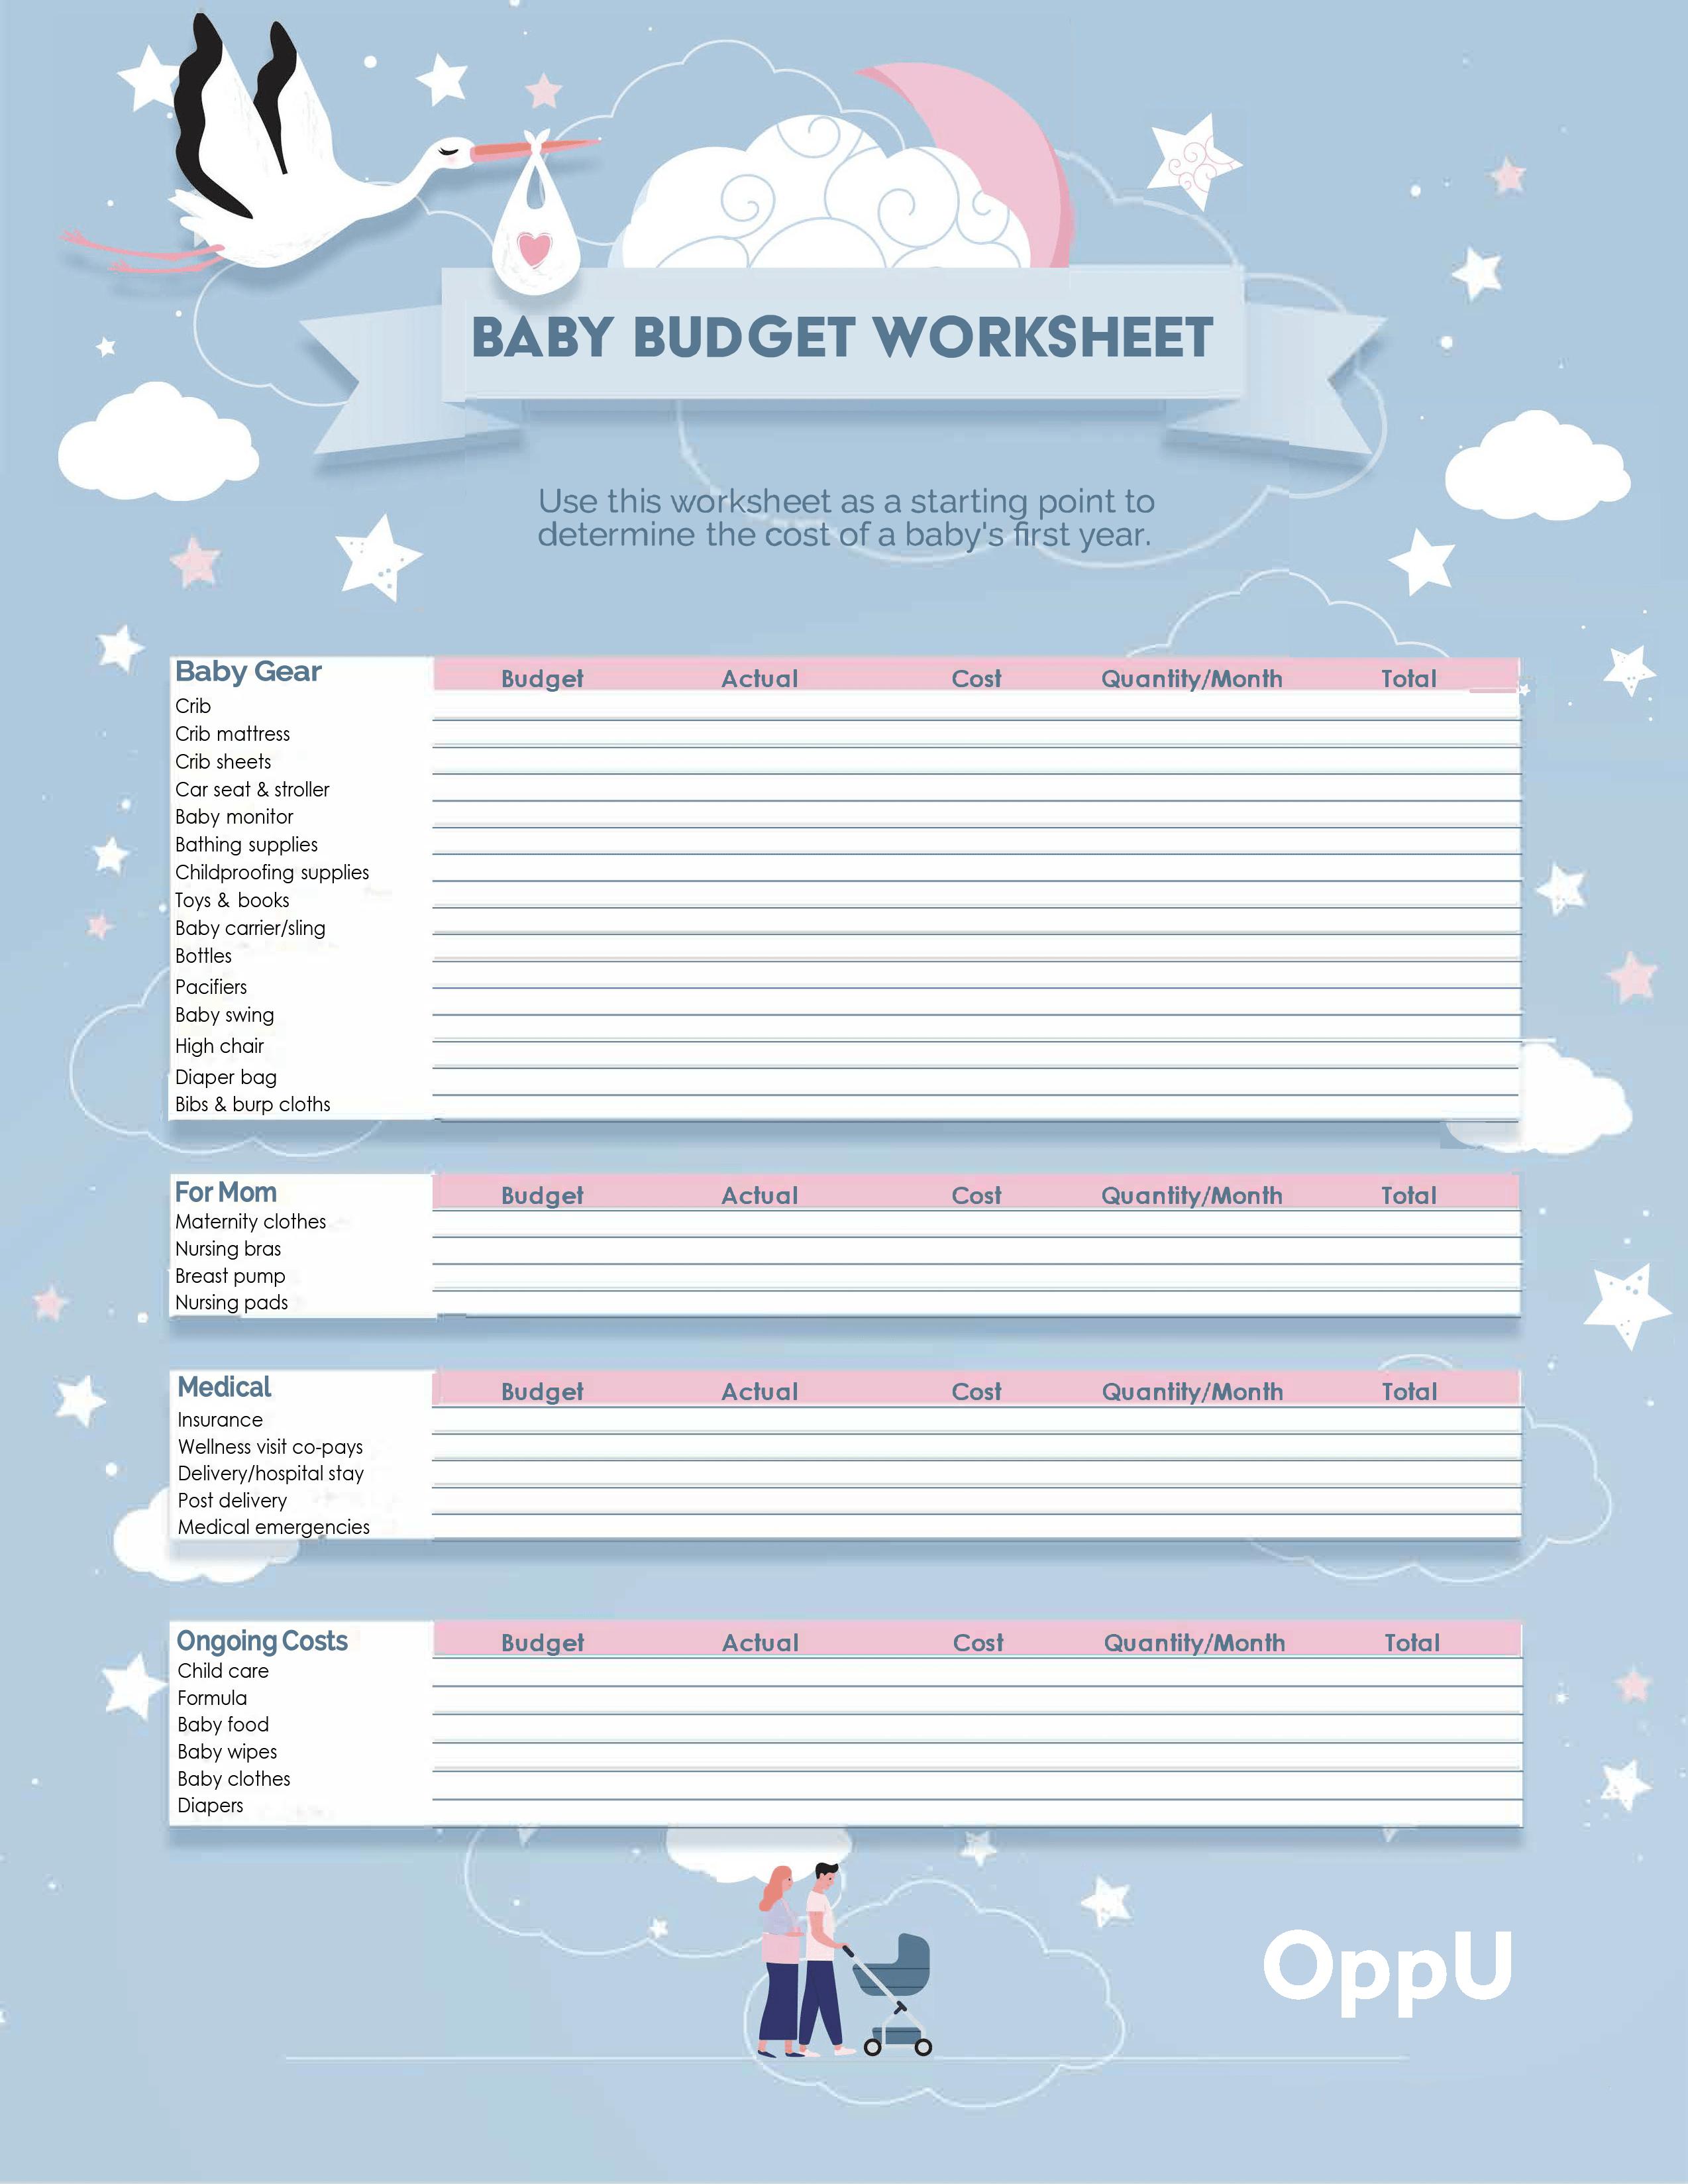 OppU Baby Budget Worksheet